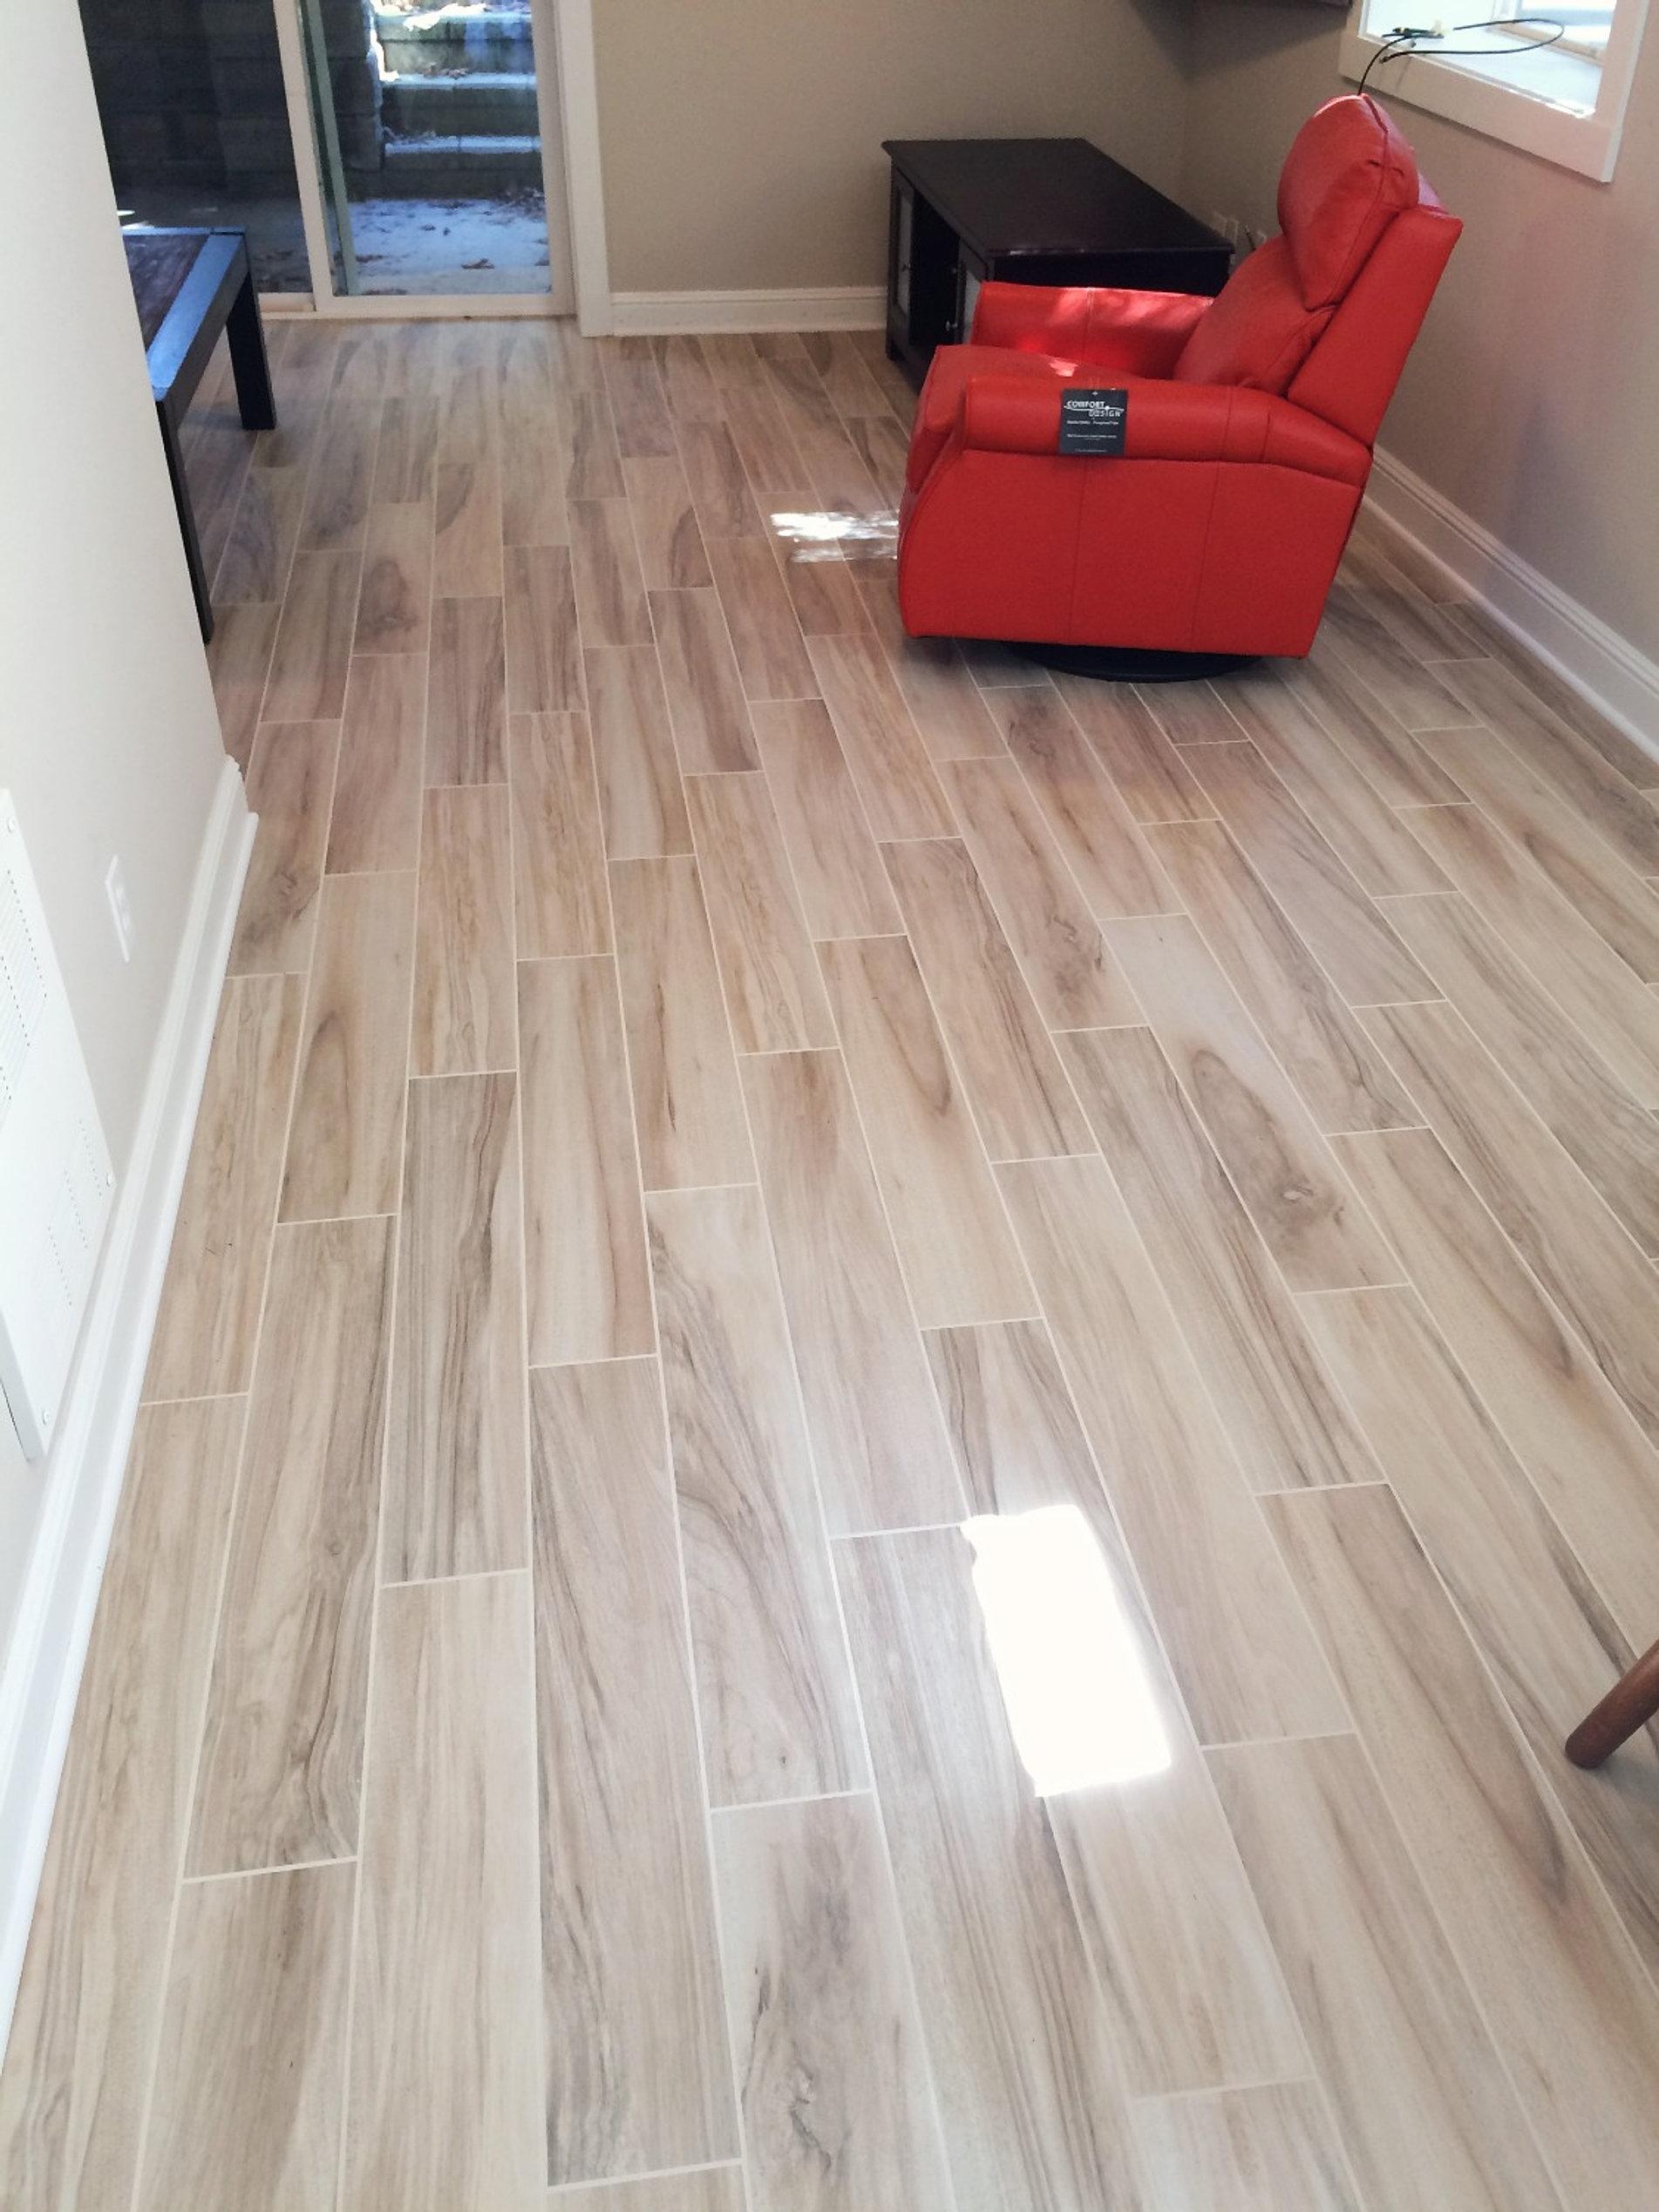 Seattle tile store kitchen bath shower wood plank porcelain tile install dailygadgetfo Choice Image